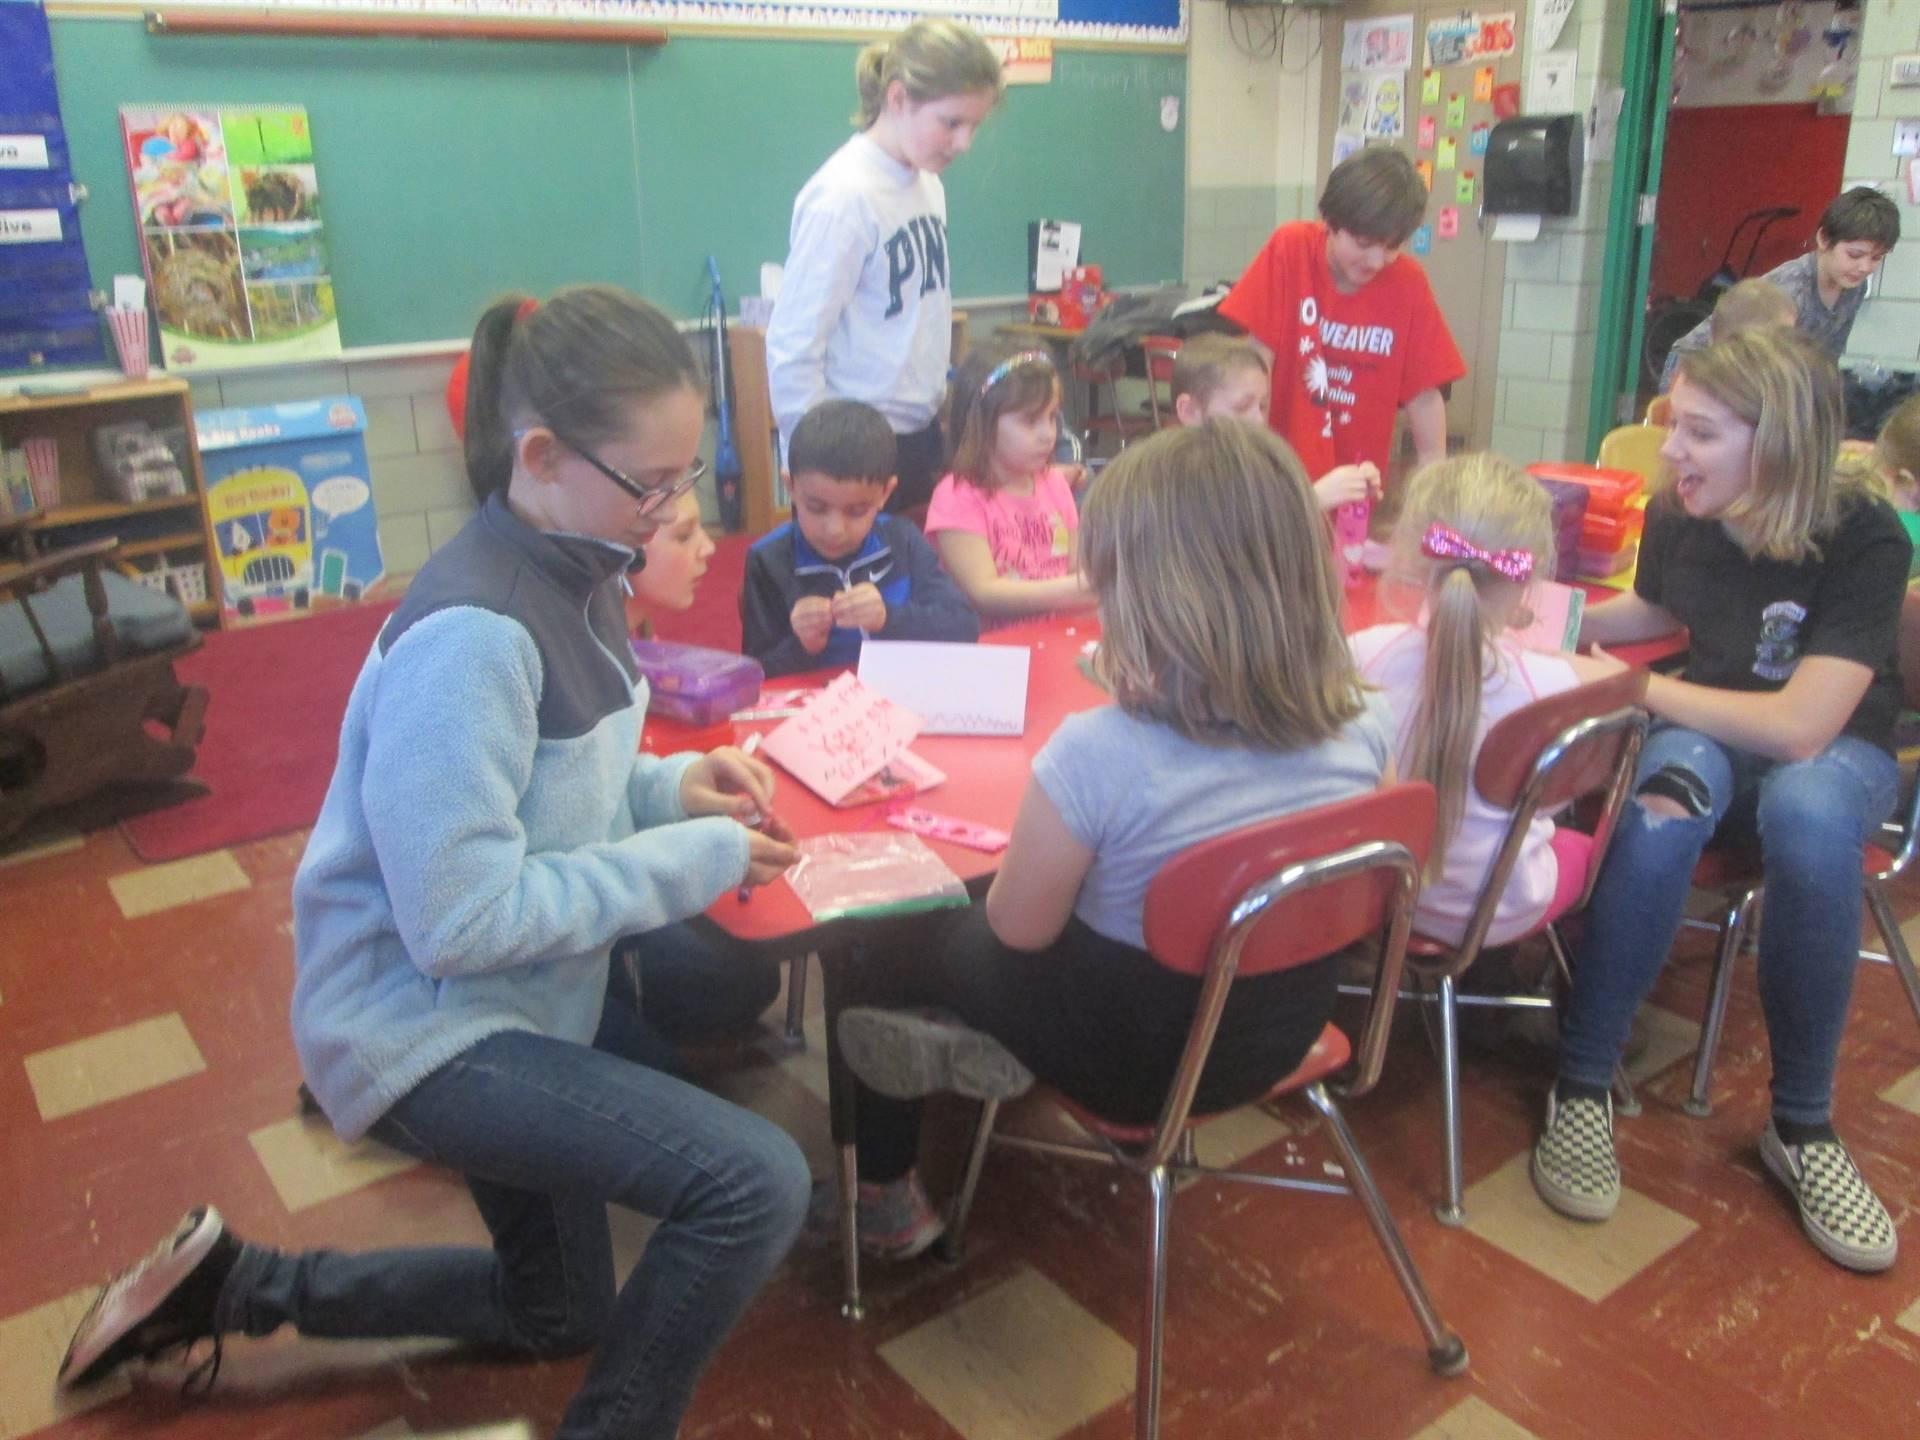 Mrs. Saiben's 6th graders assisting their kindergarten book buddies create bookmarks.